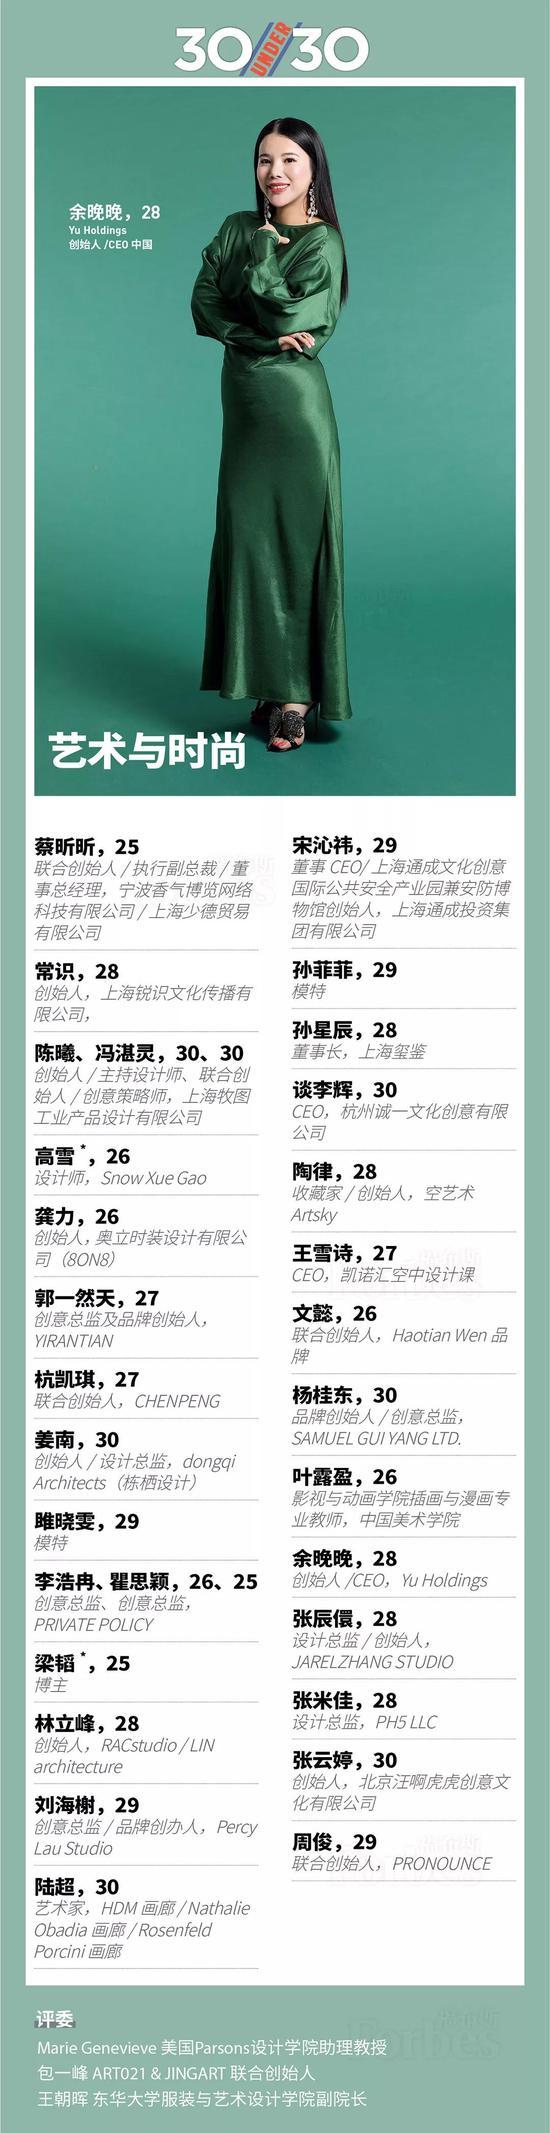 betway必威官网登陆平台 5